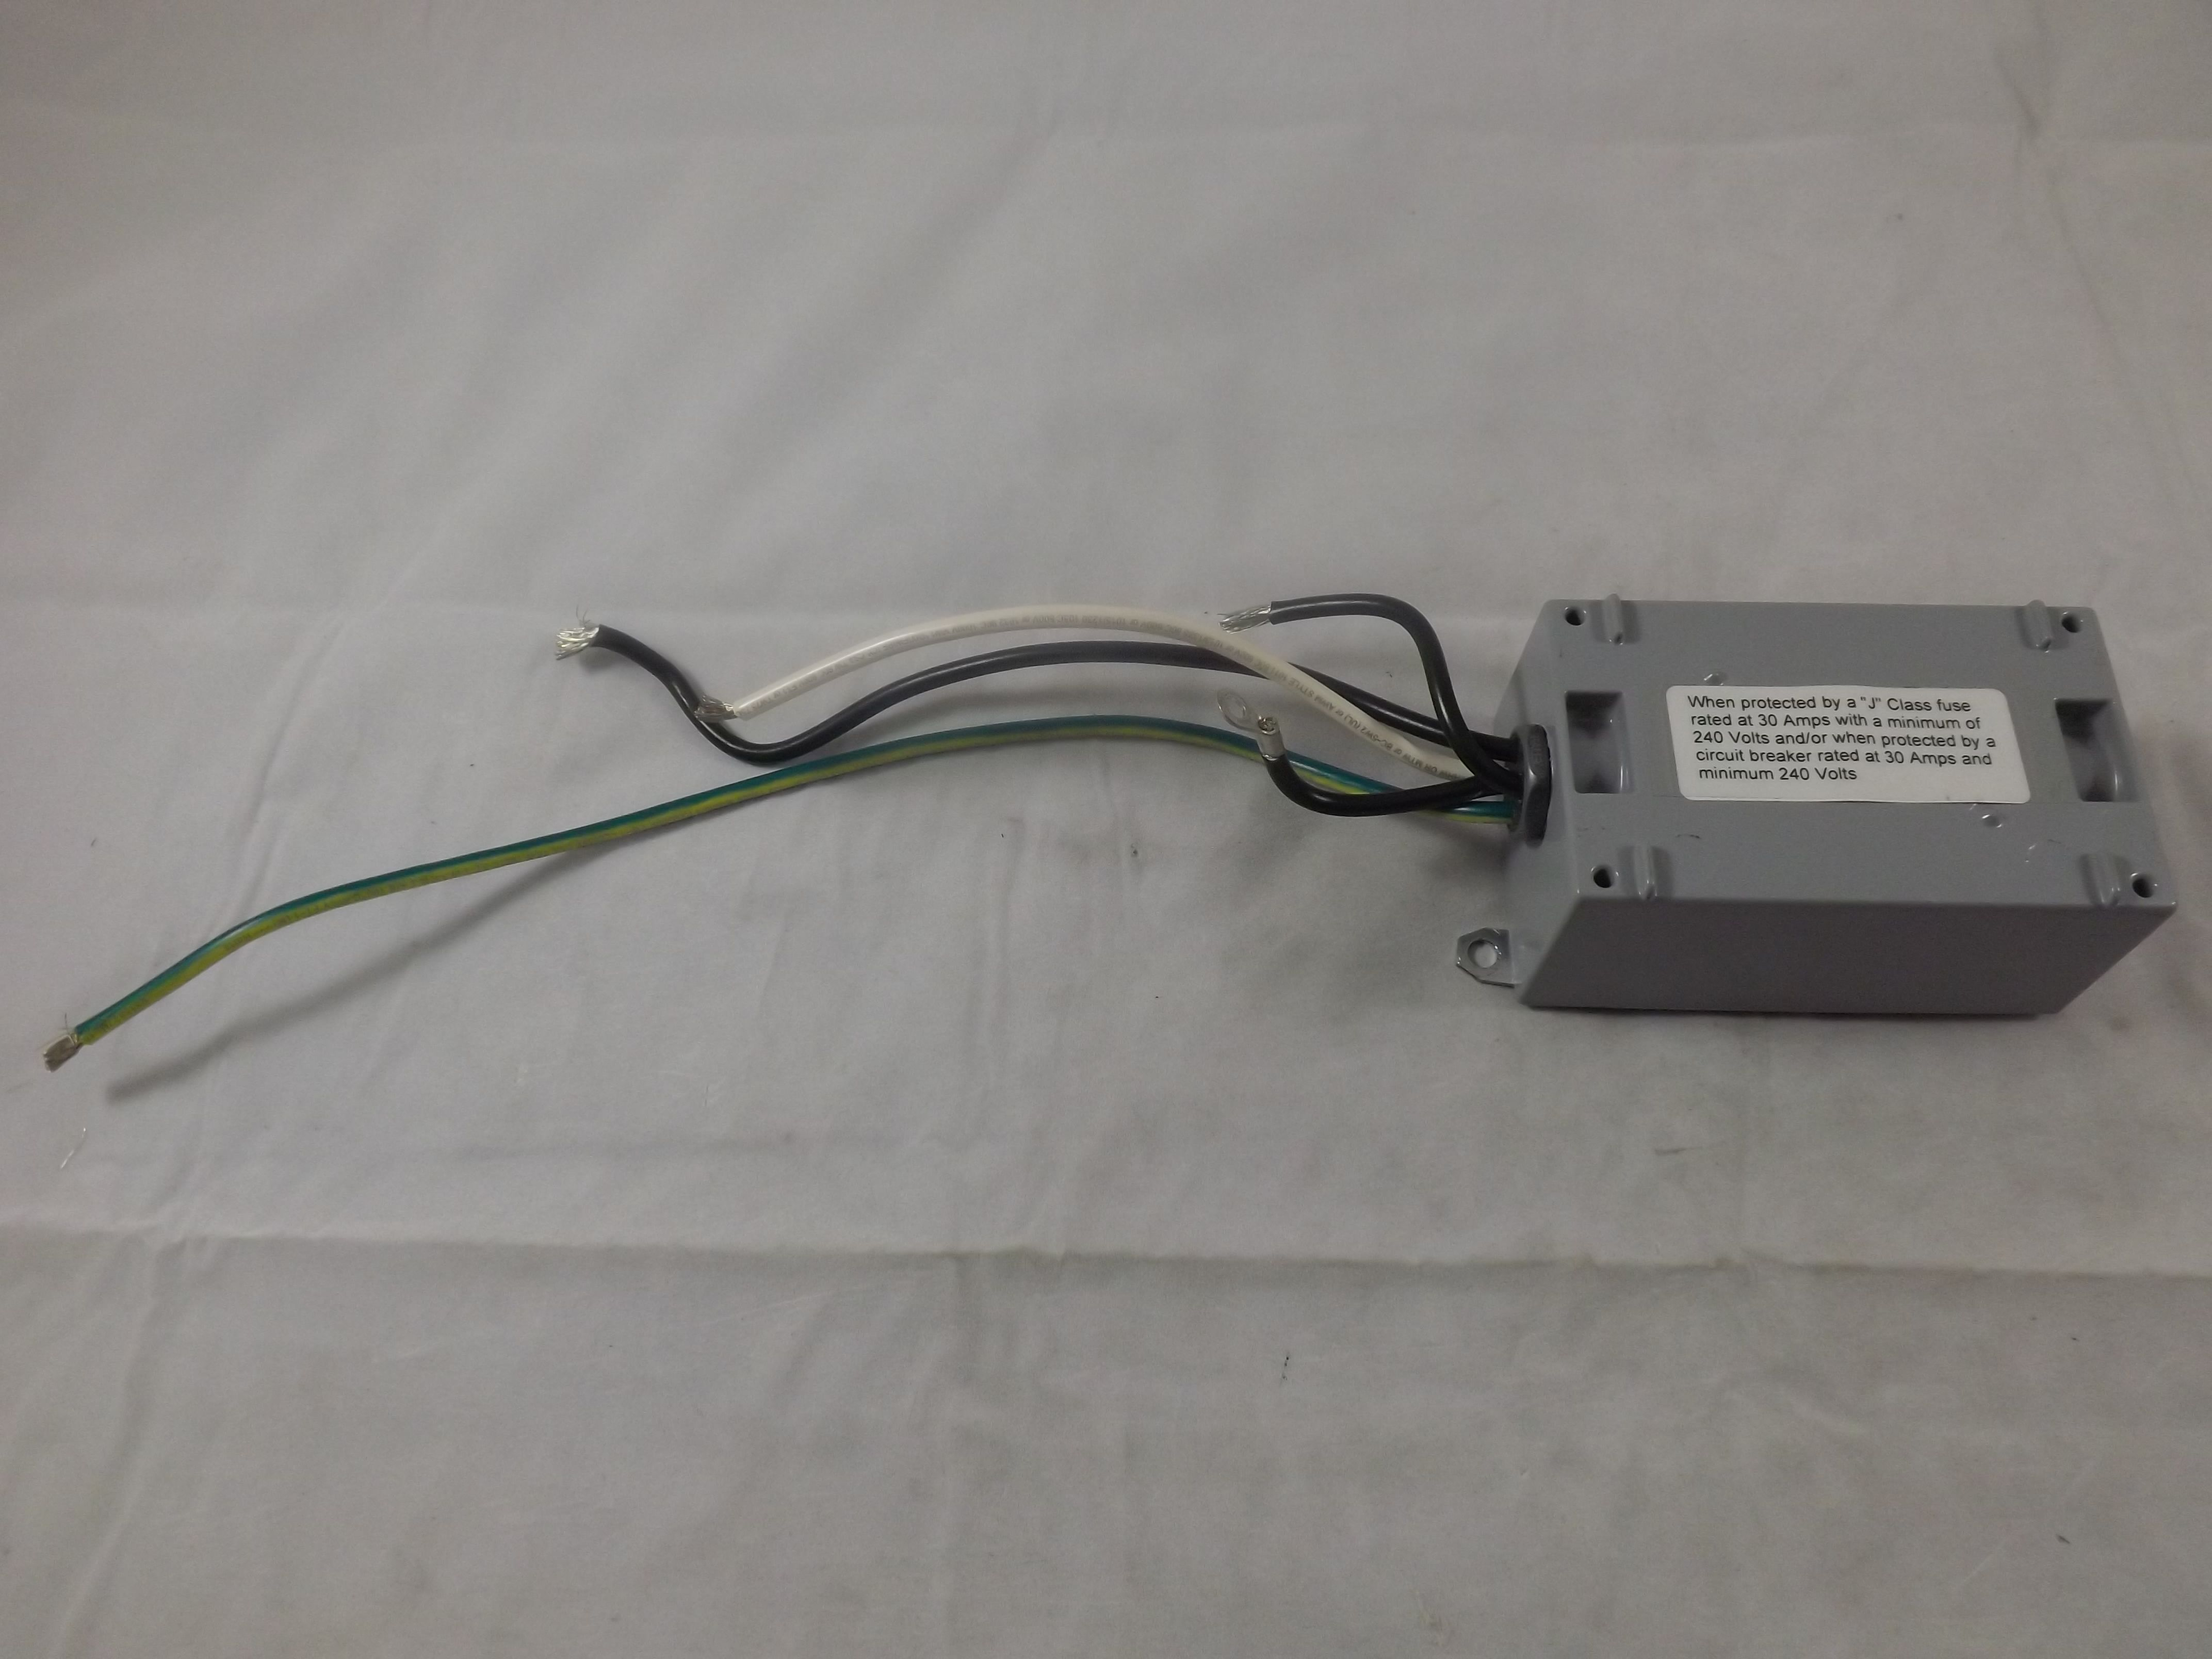 452120040 Act Communications Transhield 452 Surge Protection 120v 2 Wire Grd Surge Protection Communications Protection